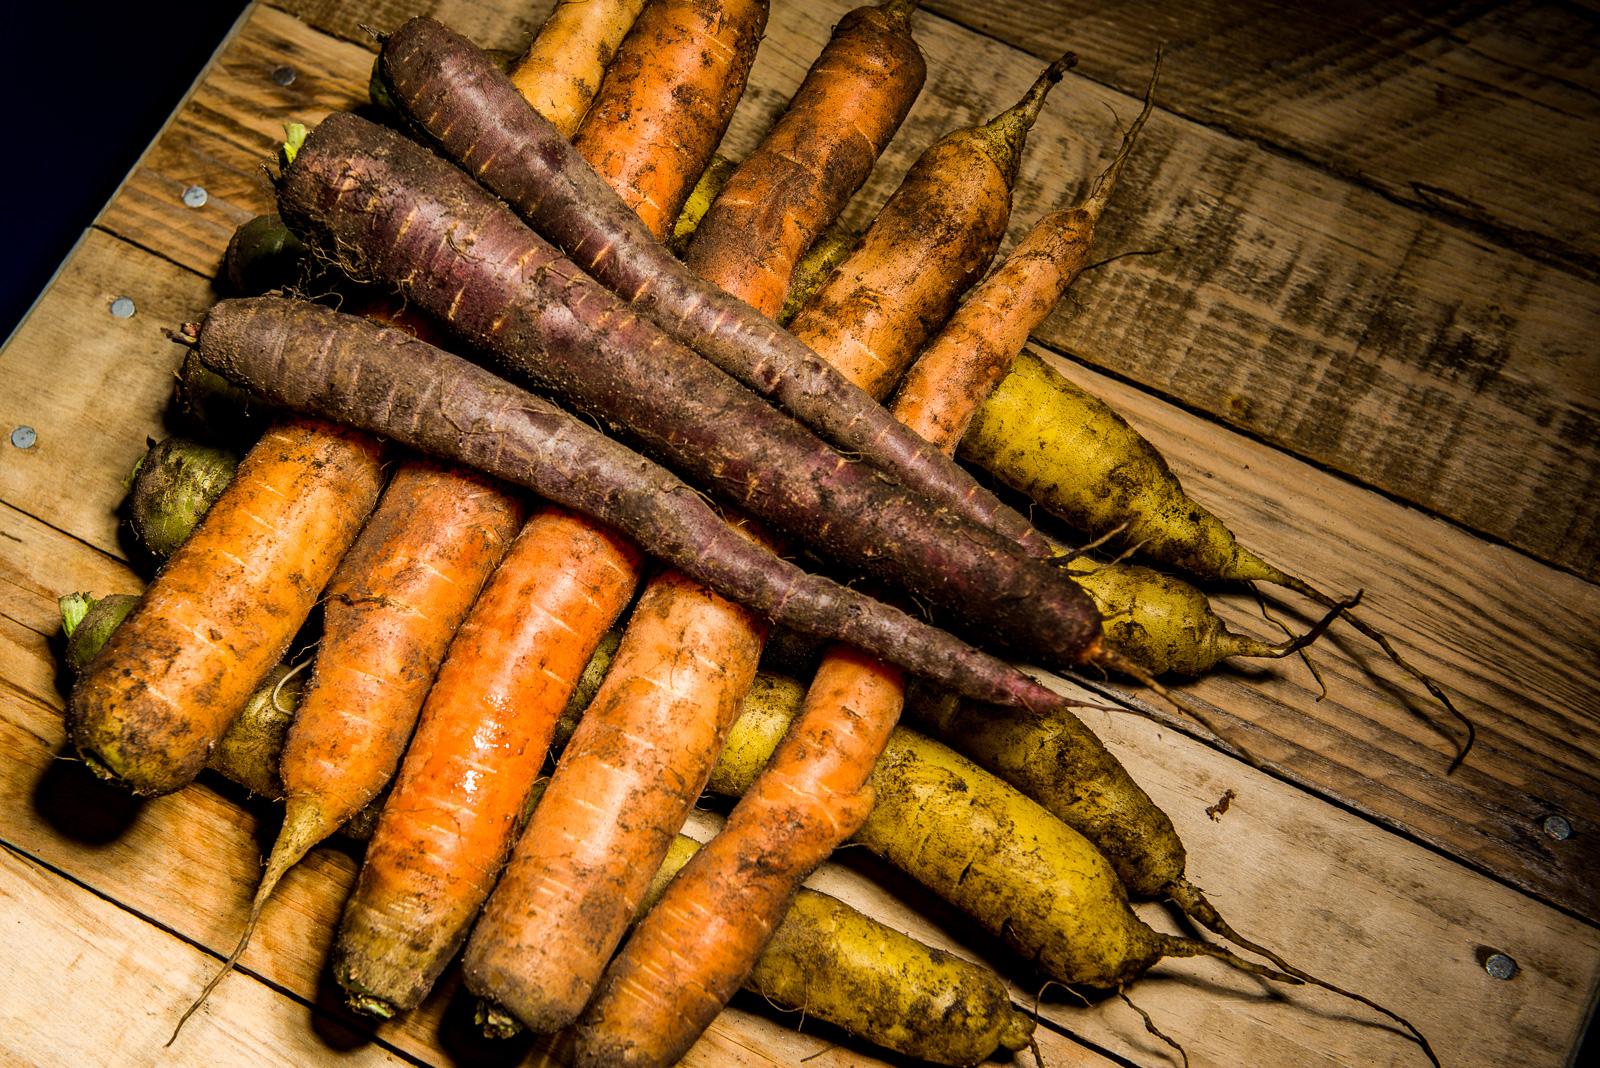 vegetables-13.jpg